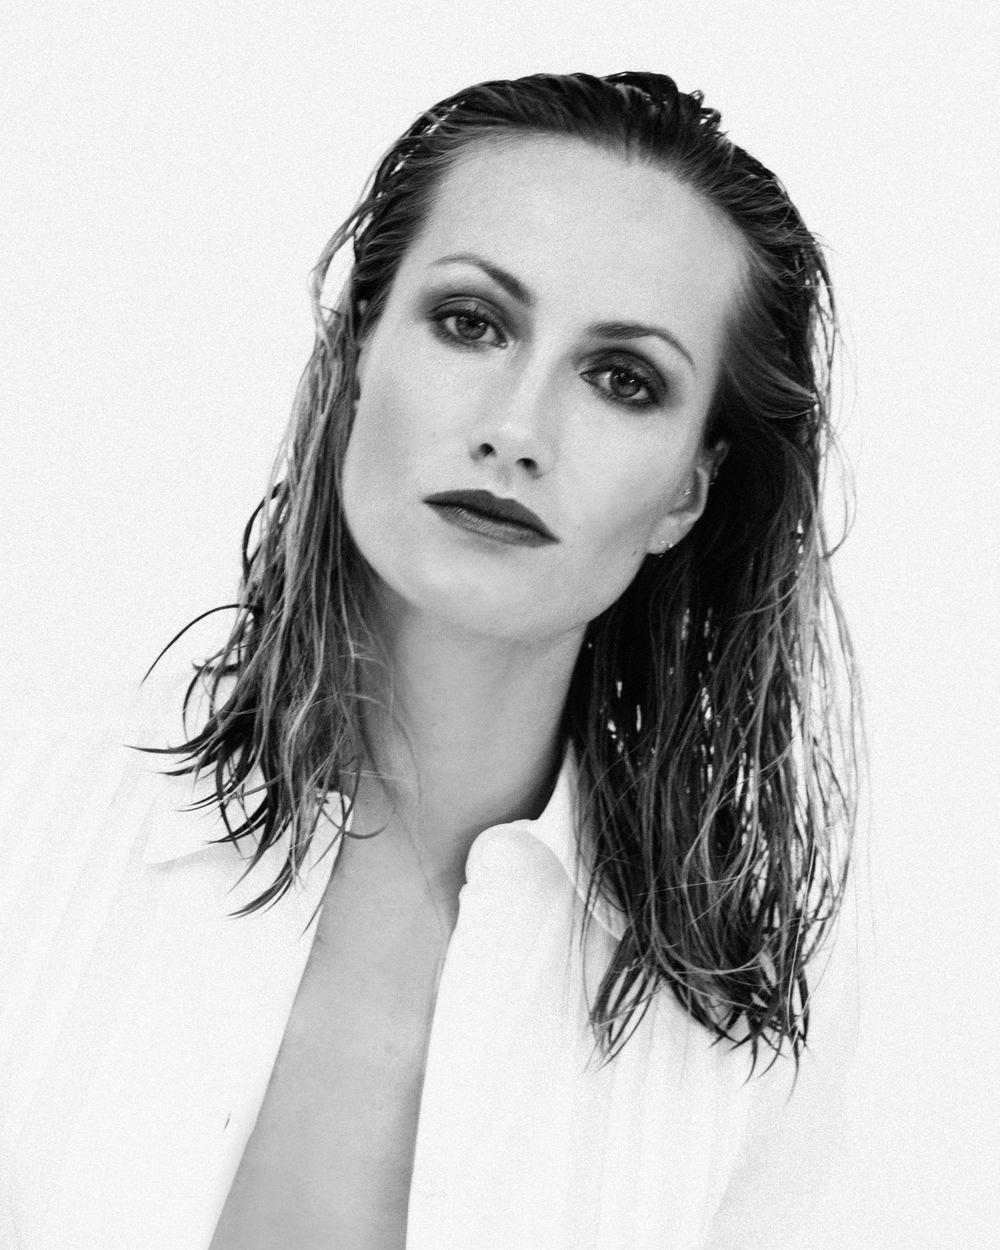 makeup-by-Mariana-Bull-05.jpg